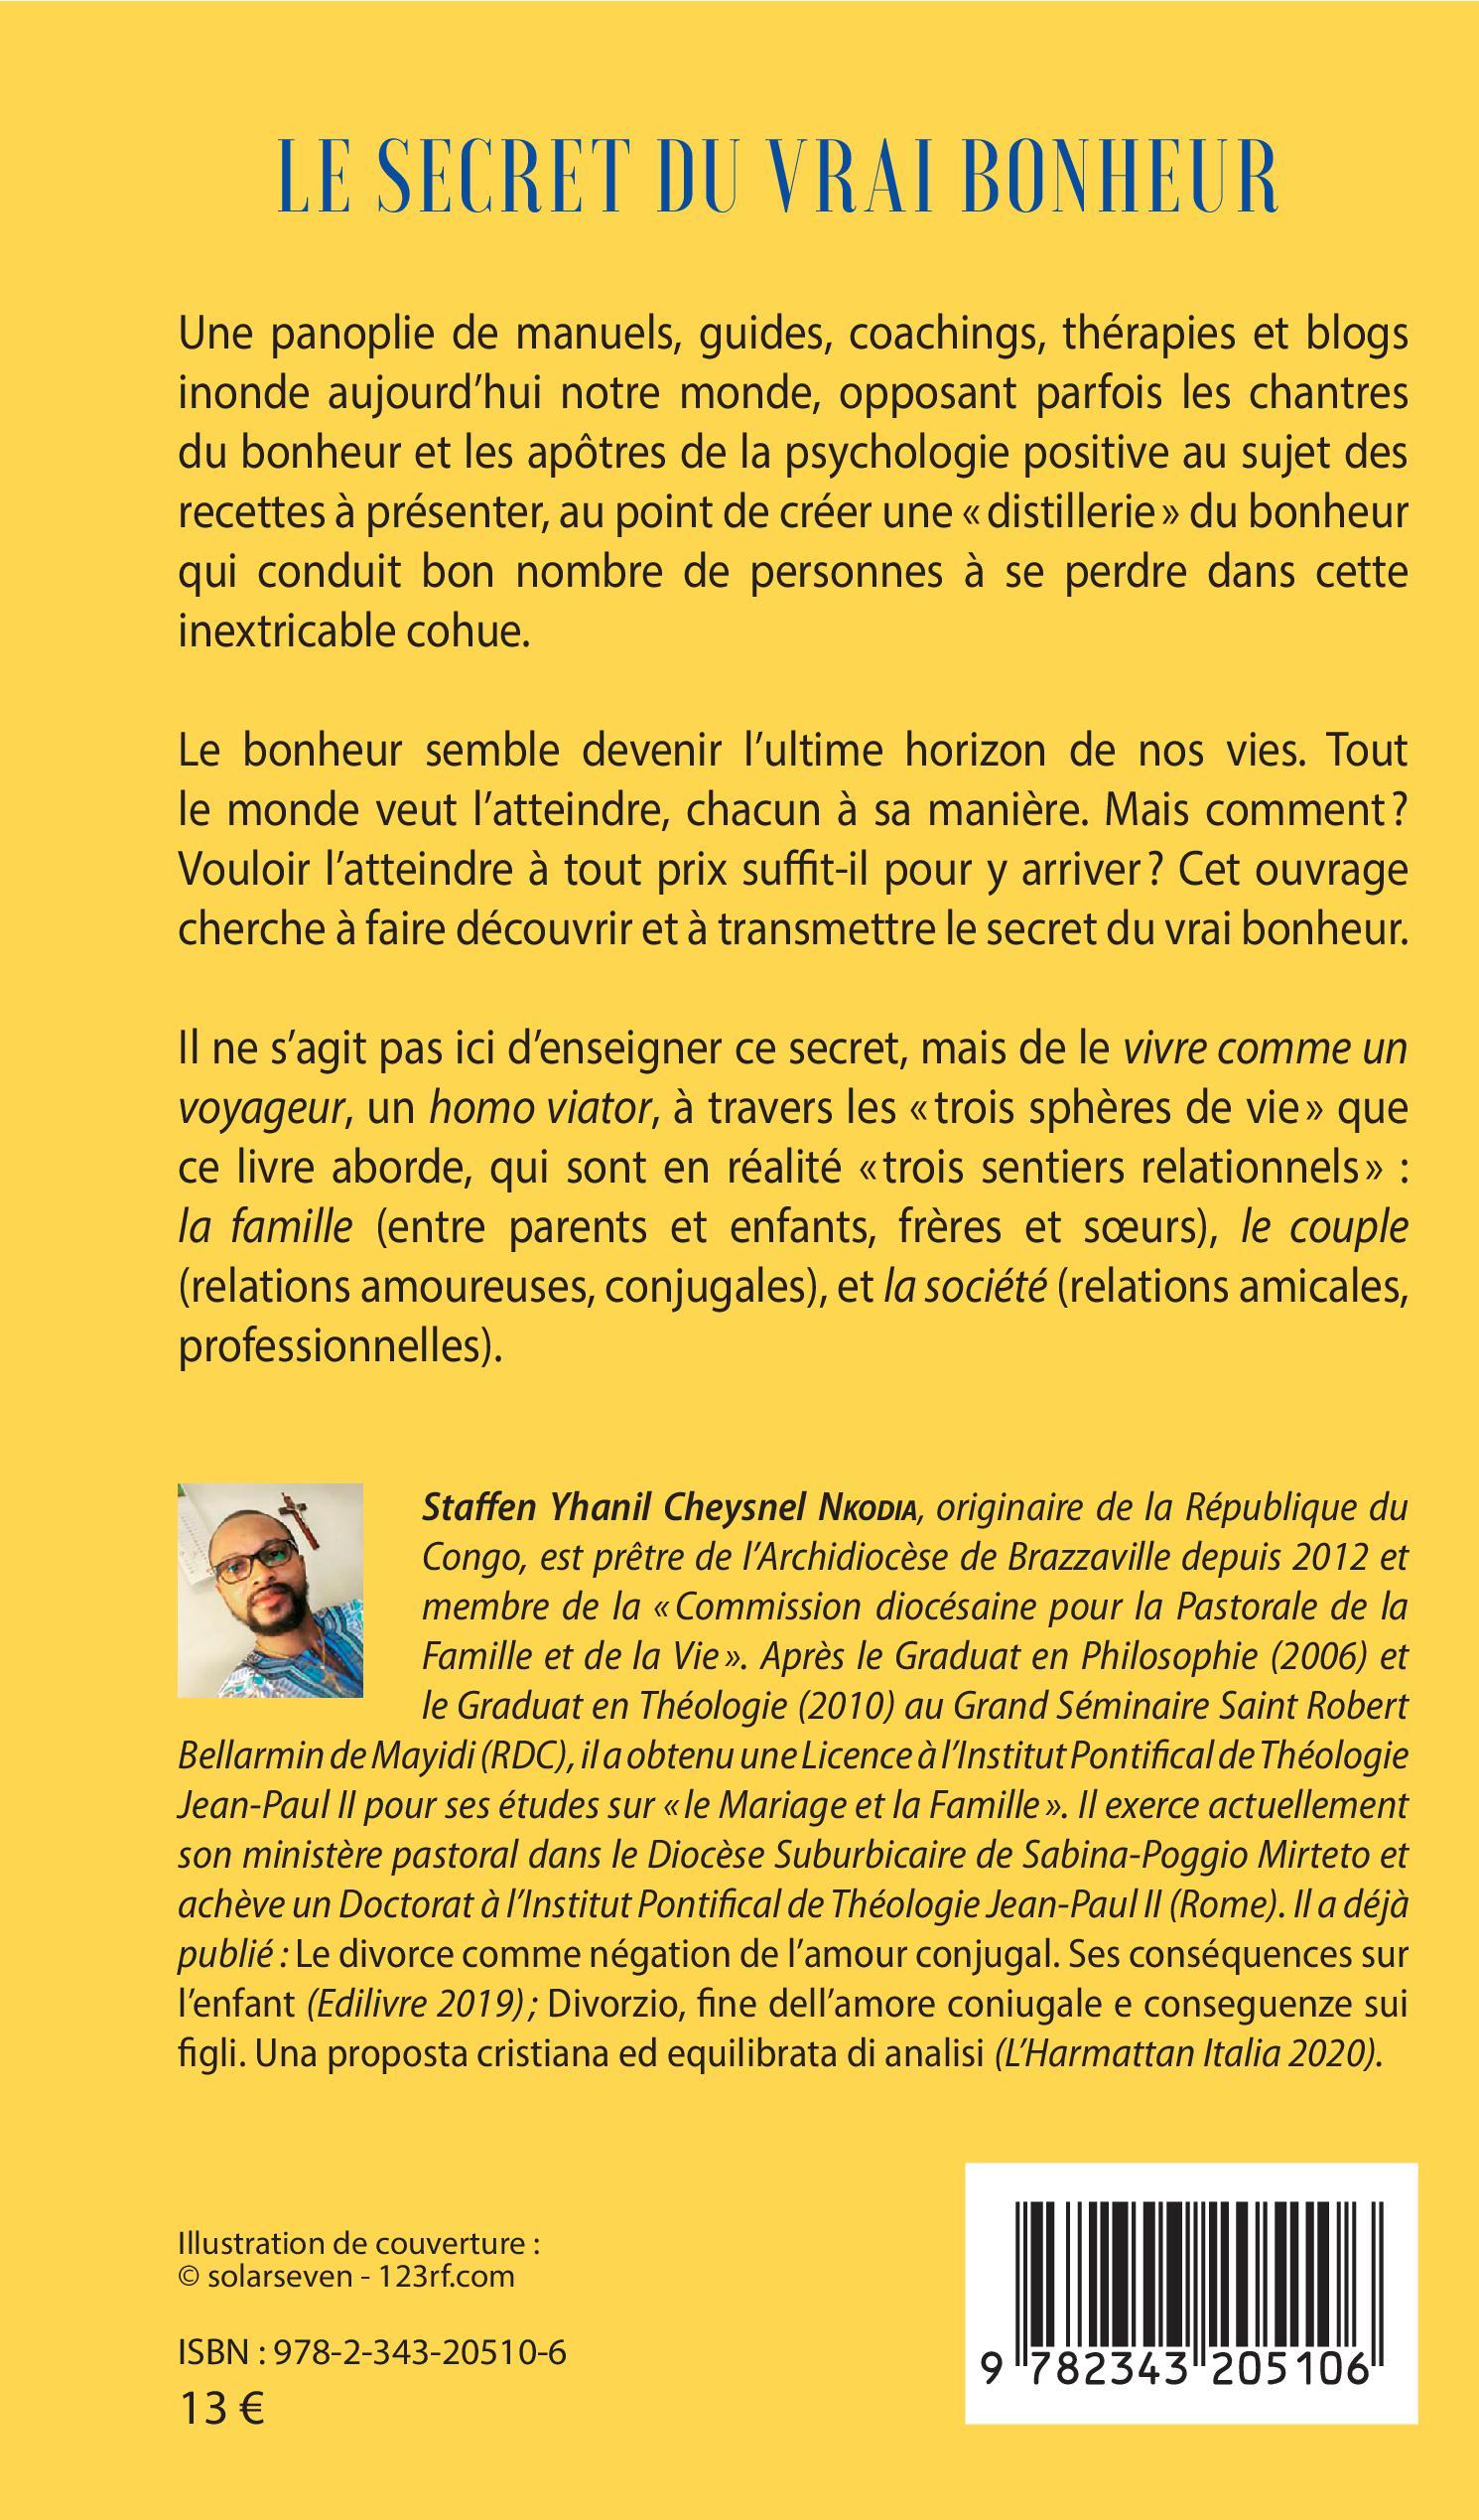 Le Secret Du Vrai Bonheur Contre La Dictature De L Individualisme Staffen Yhanil Cheysnel Nkodia Livre Ebook Epub Idee Lecture Ete